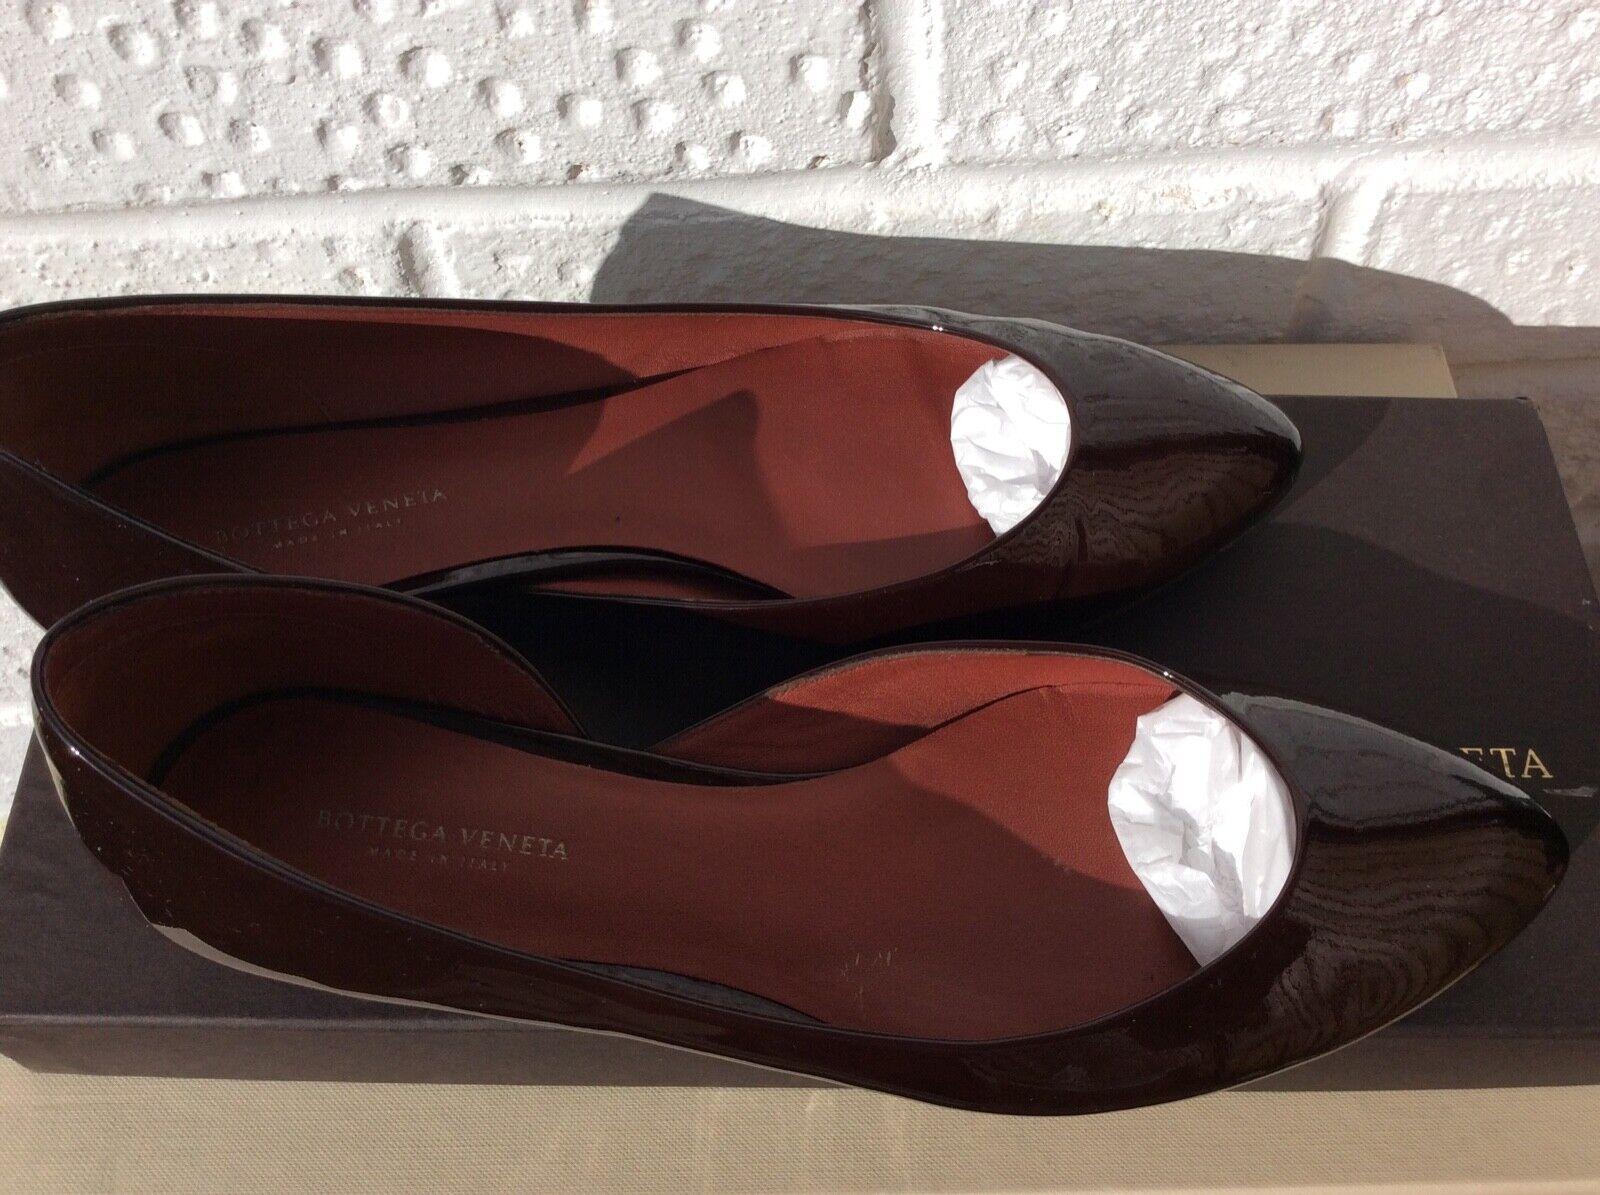 Bottega Veneta brevet Flats 37.5 (4.5 UK) marron EX détenu